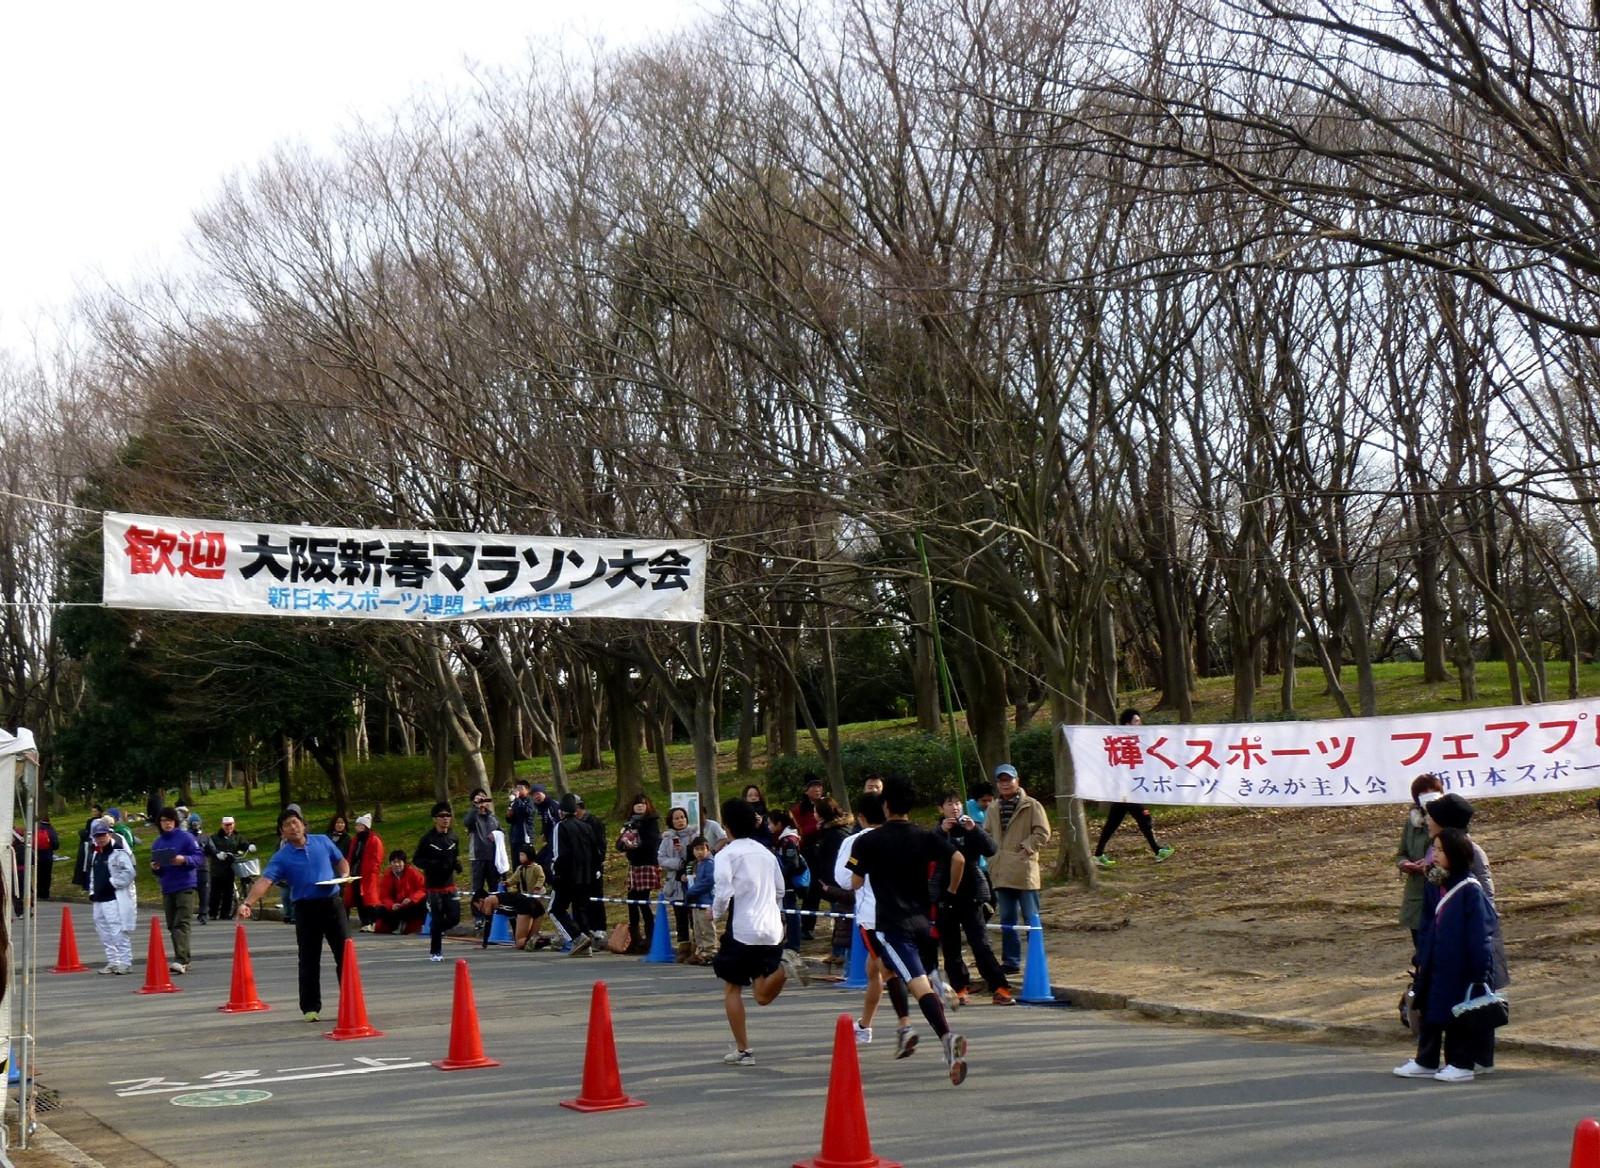 Shinsyunmarathon2013_2